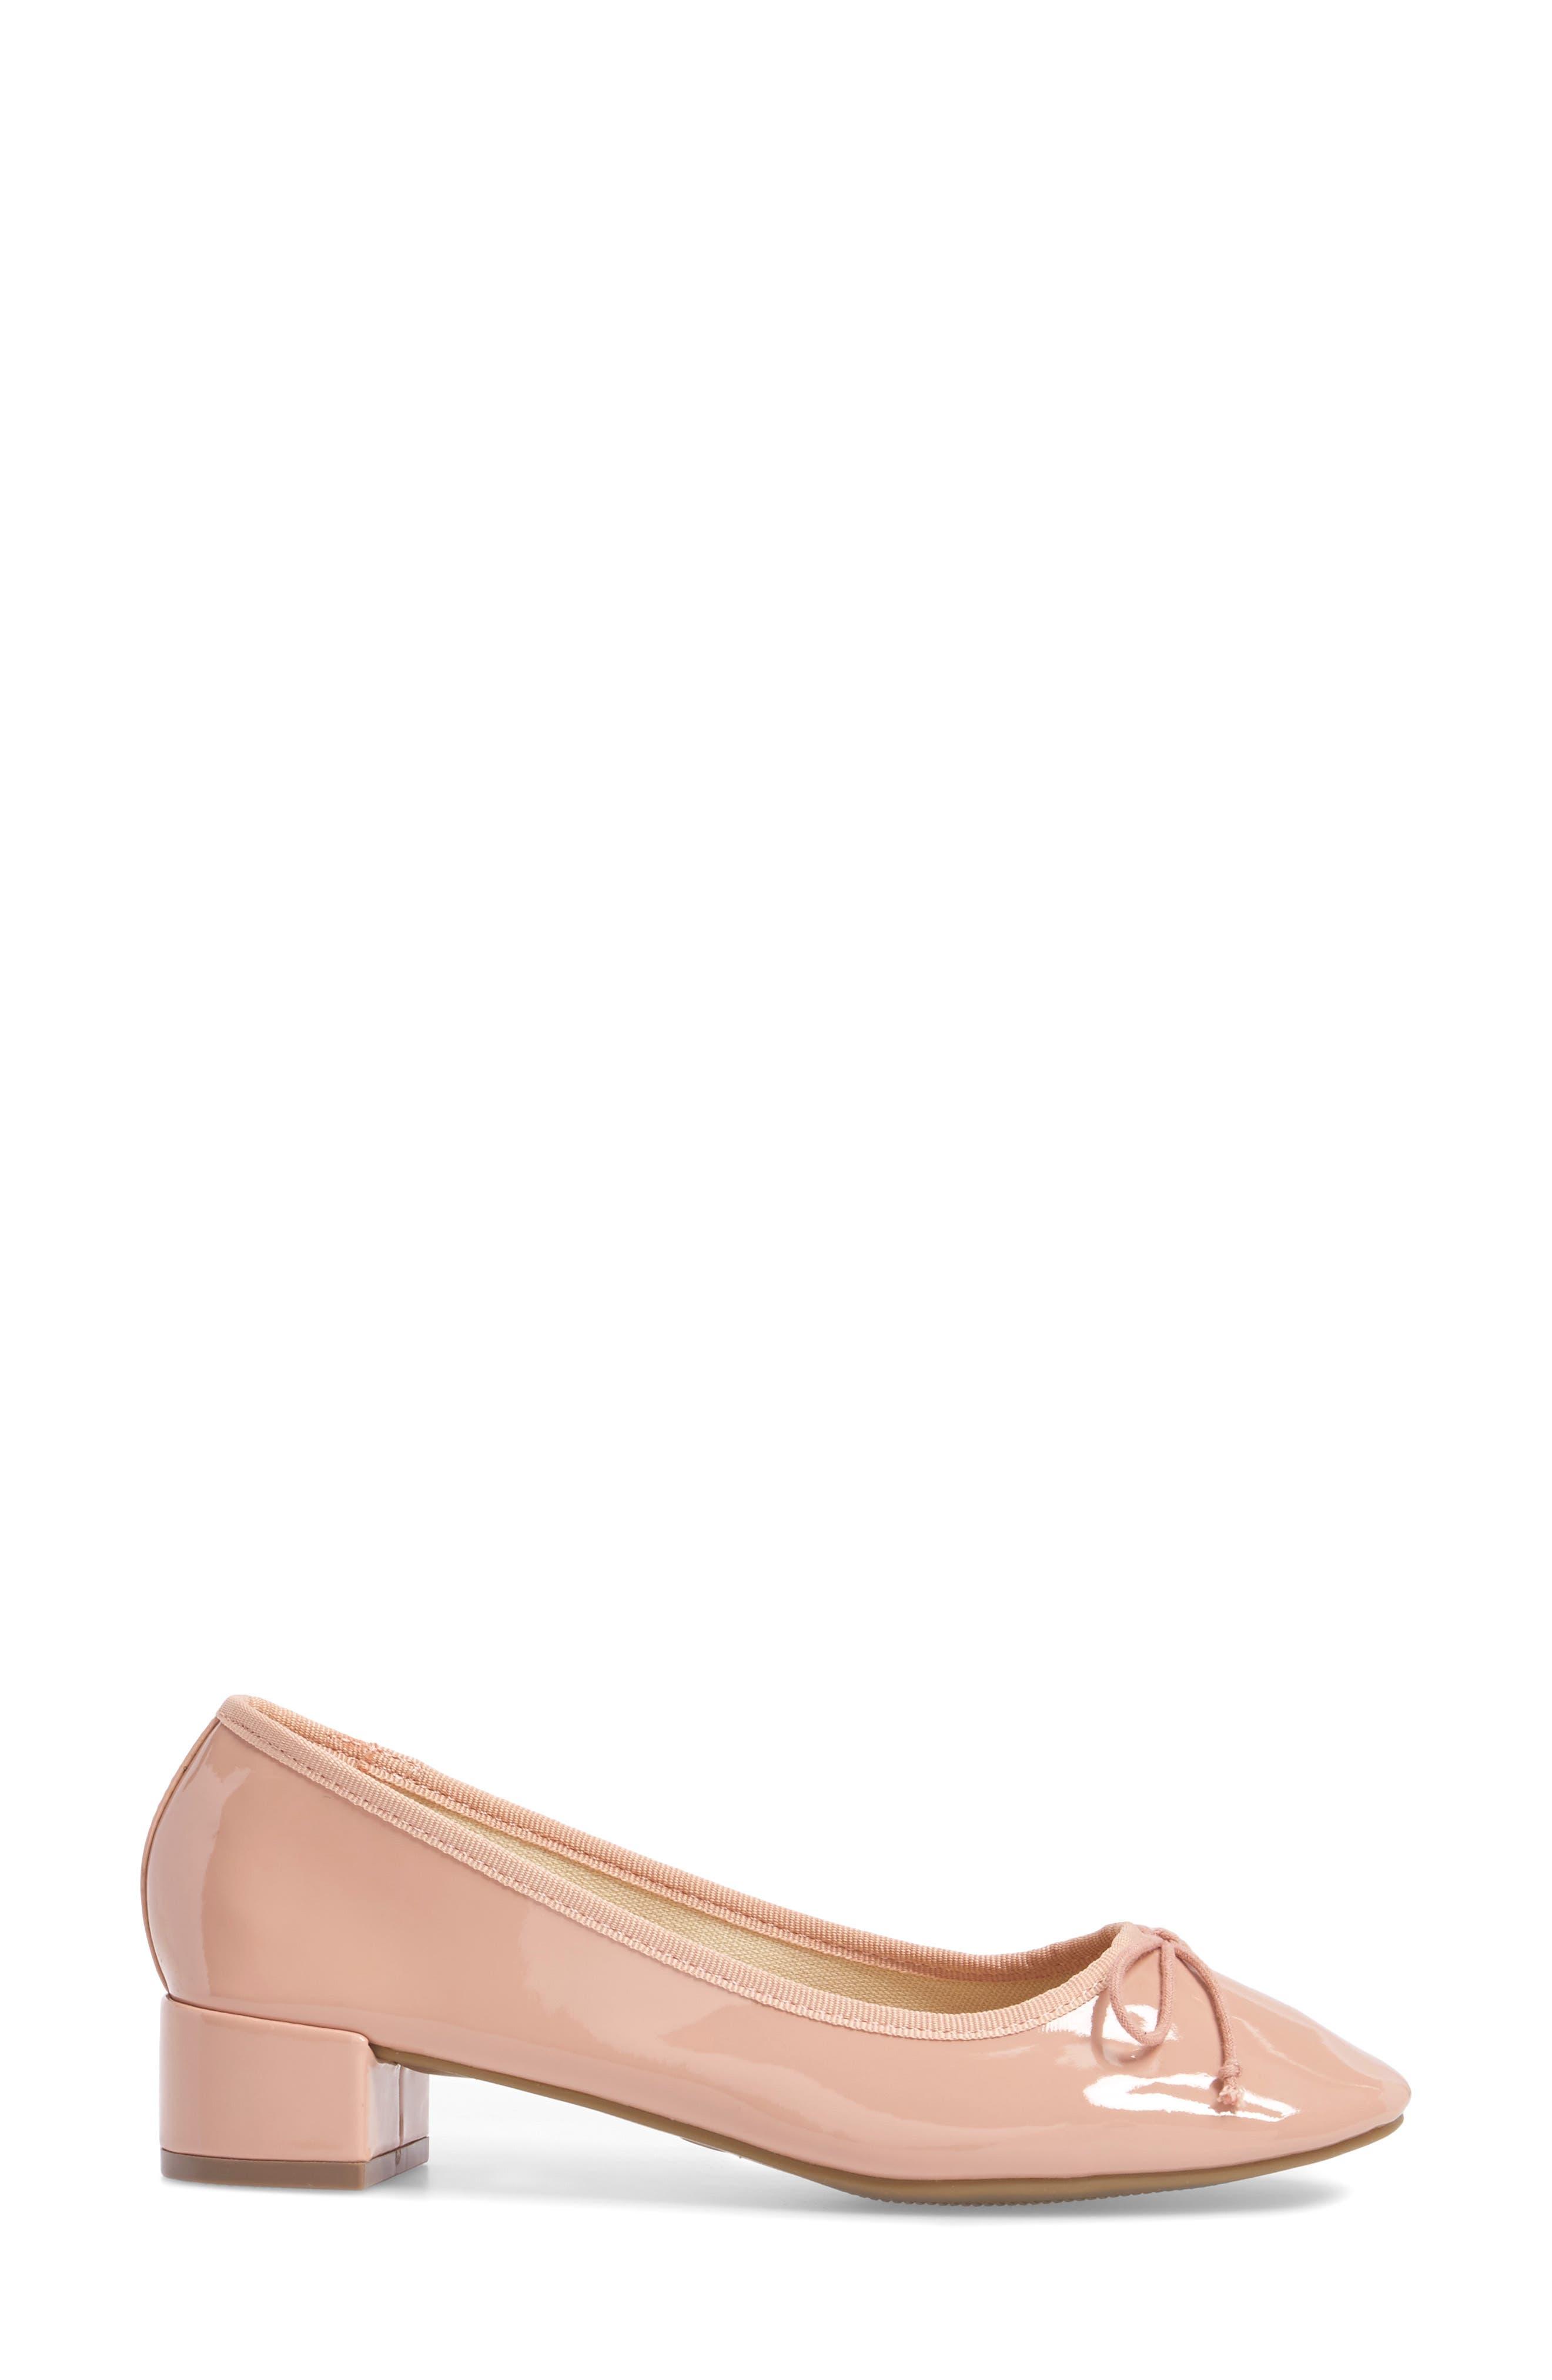 Glory Heeled Ballerina Slippers,                             Alternate thumbnail 4, color,                             650